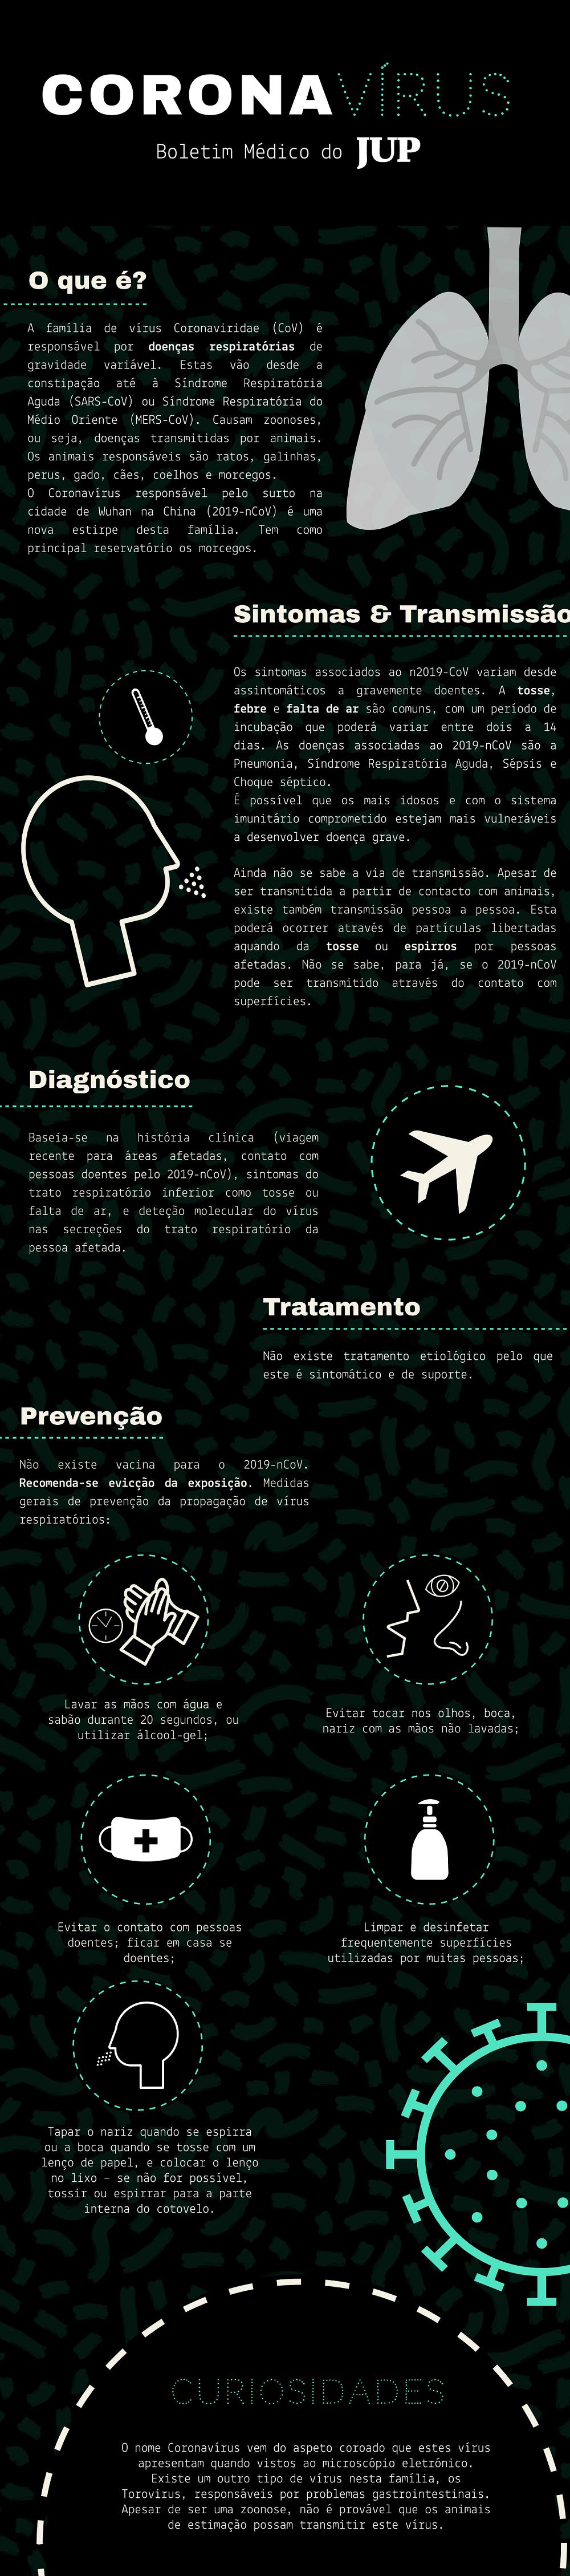 Infografia: Giulia Pedrosa